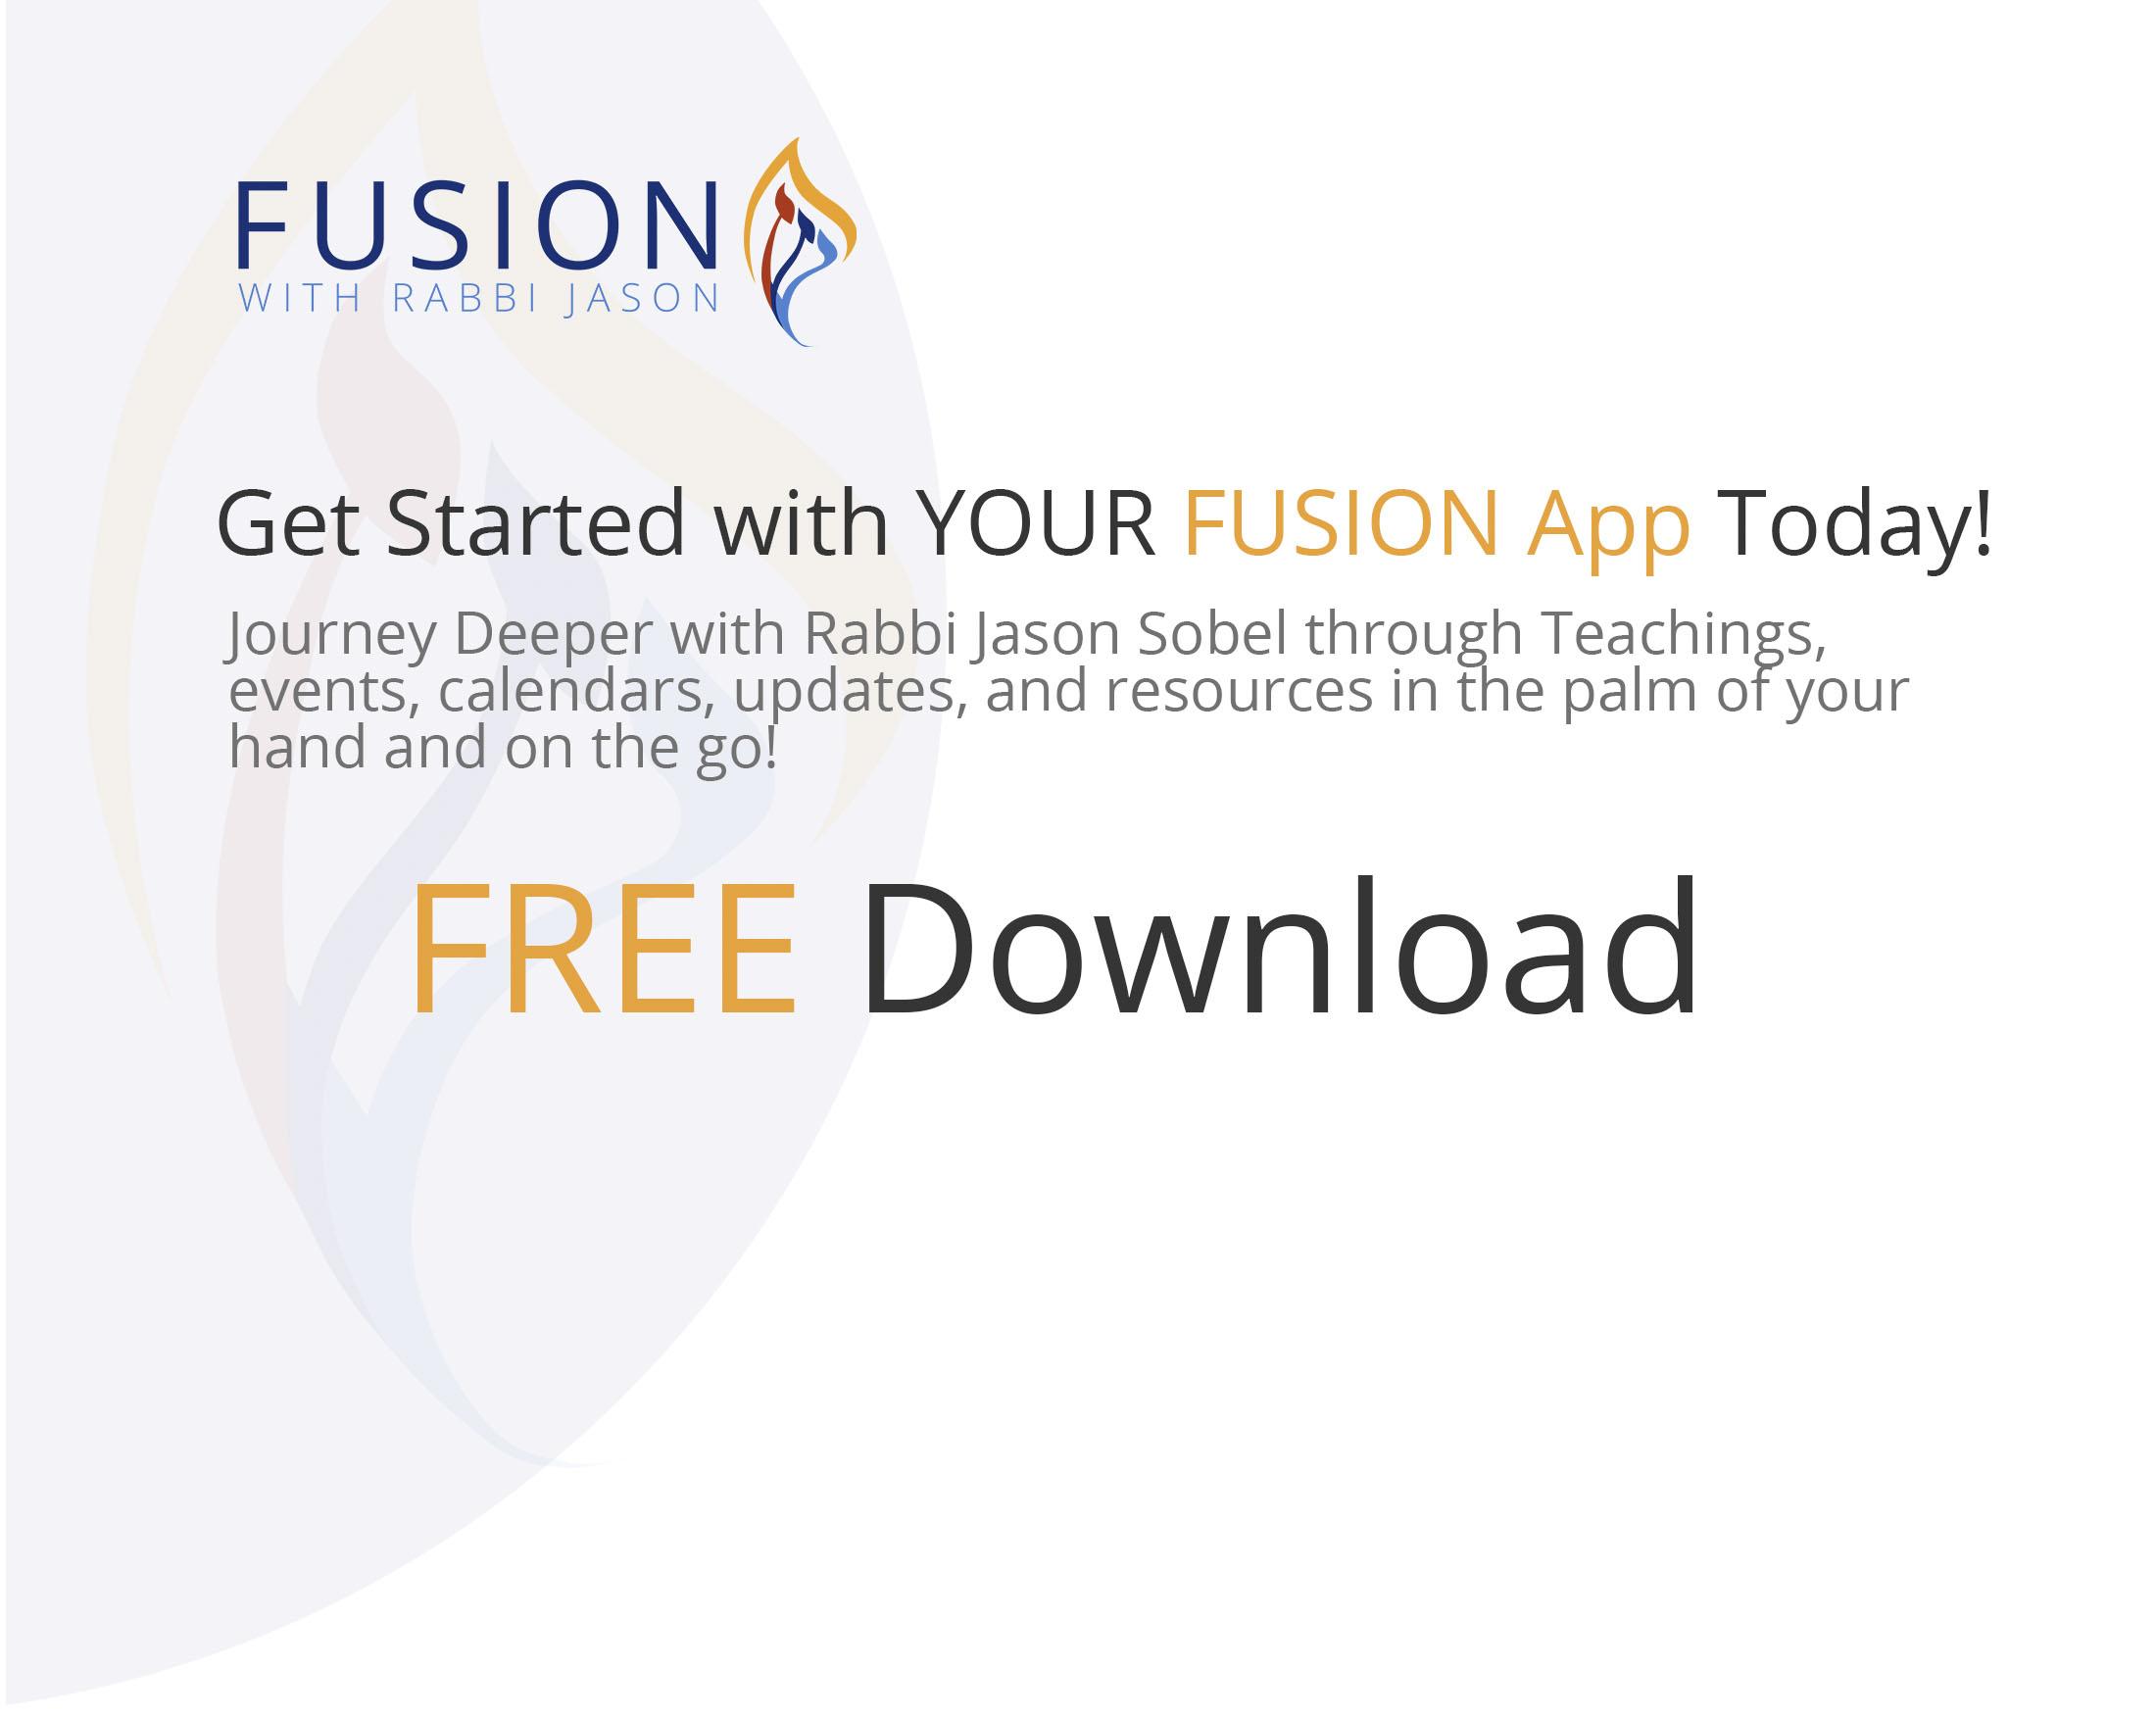 Fusion App Download